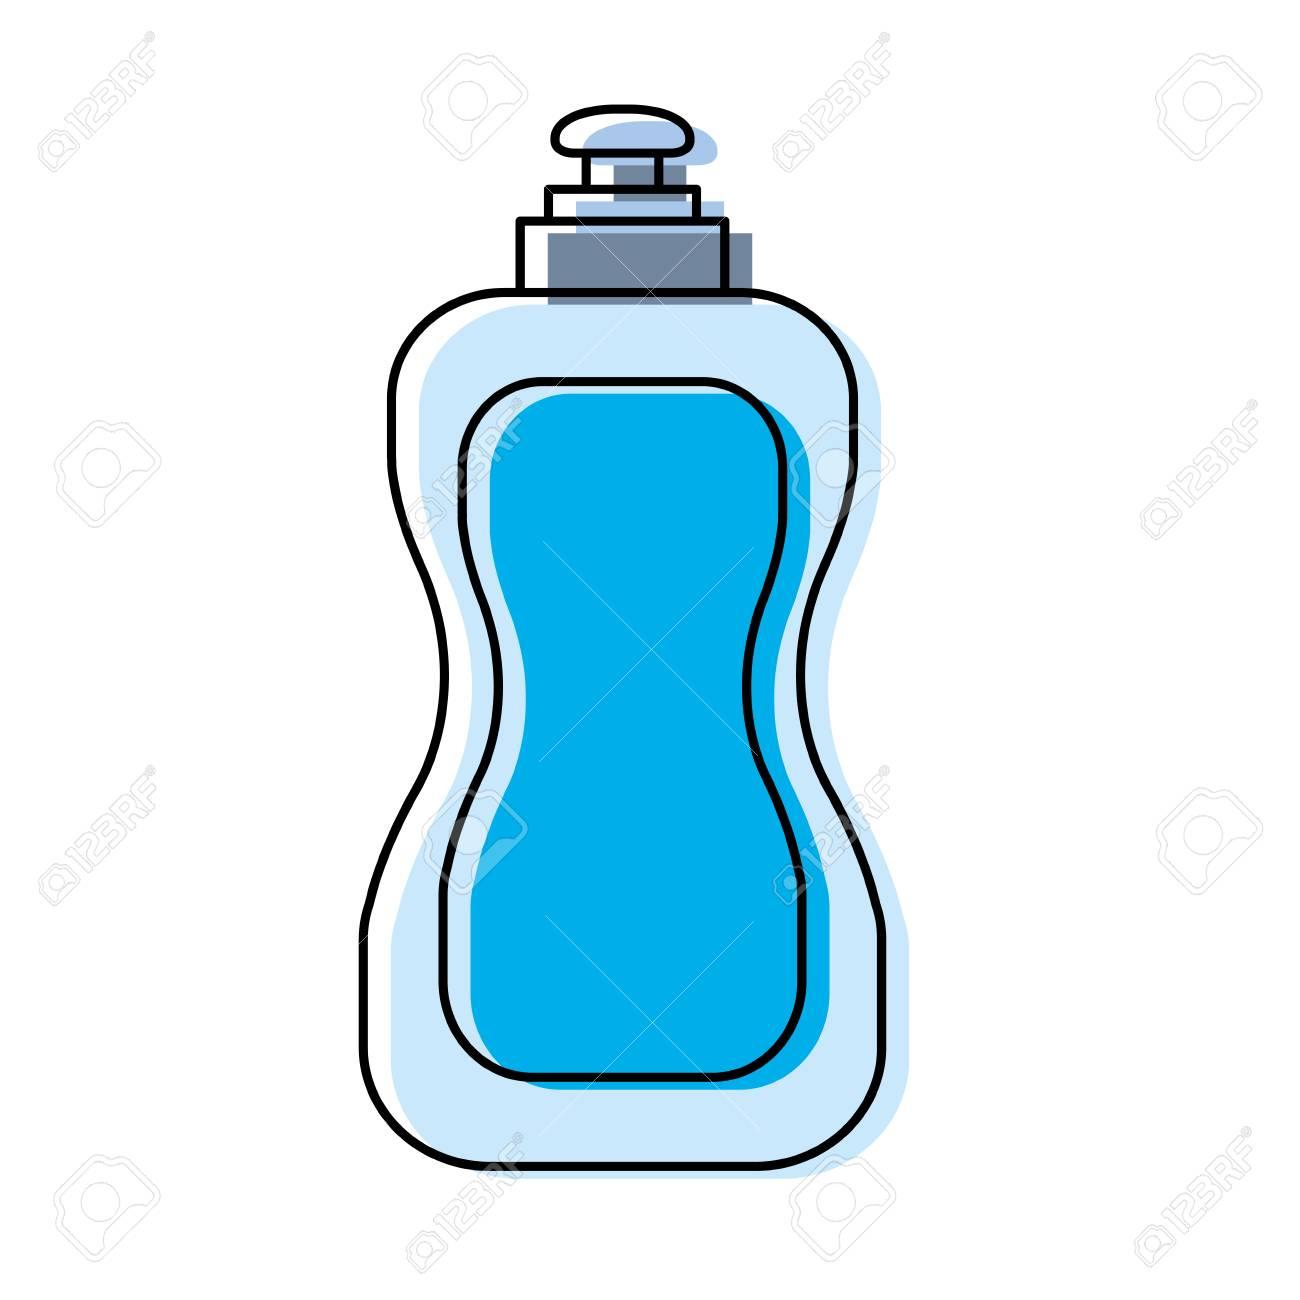 pastel blue dish washing soap over white background vector illustration.